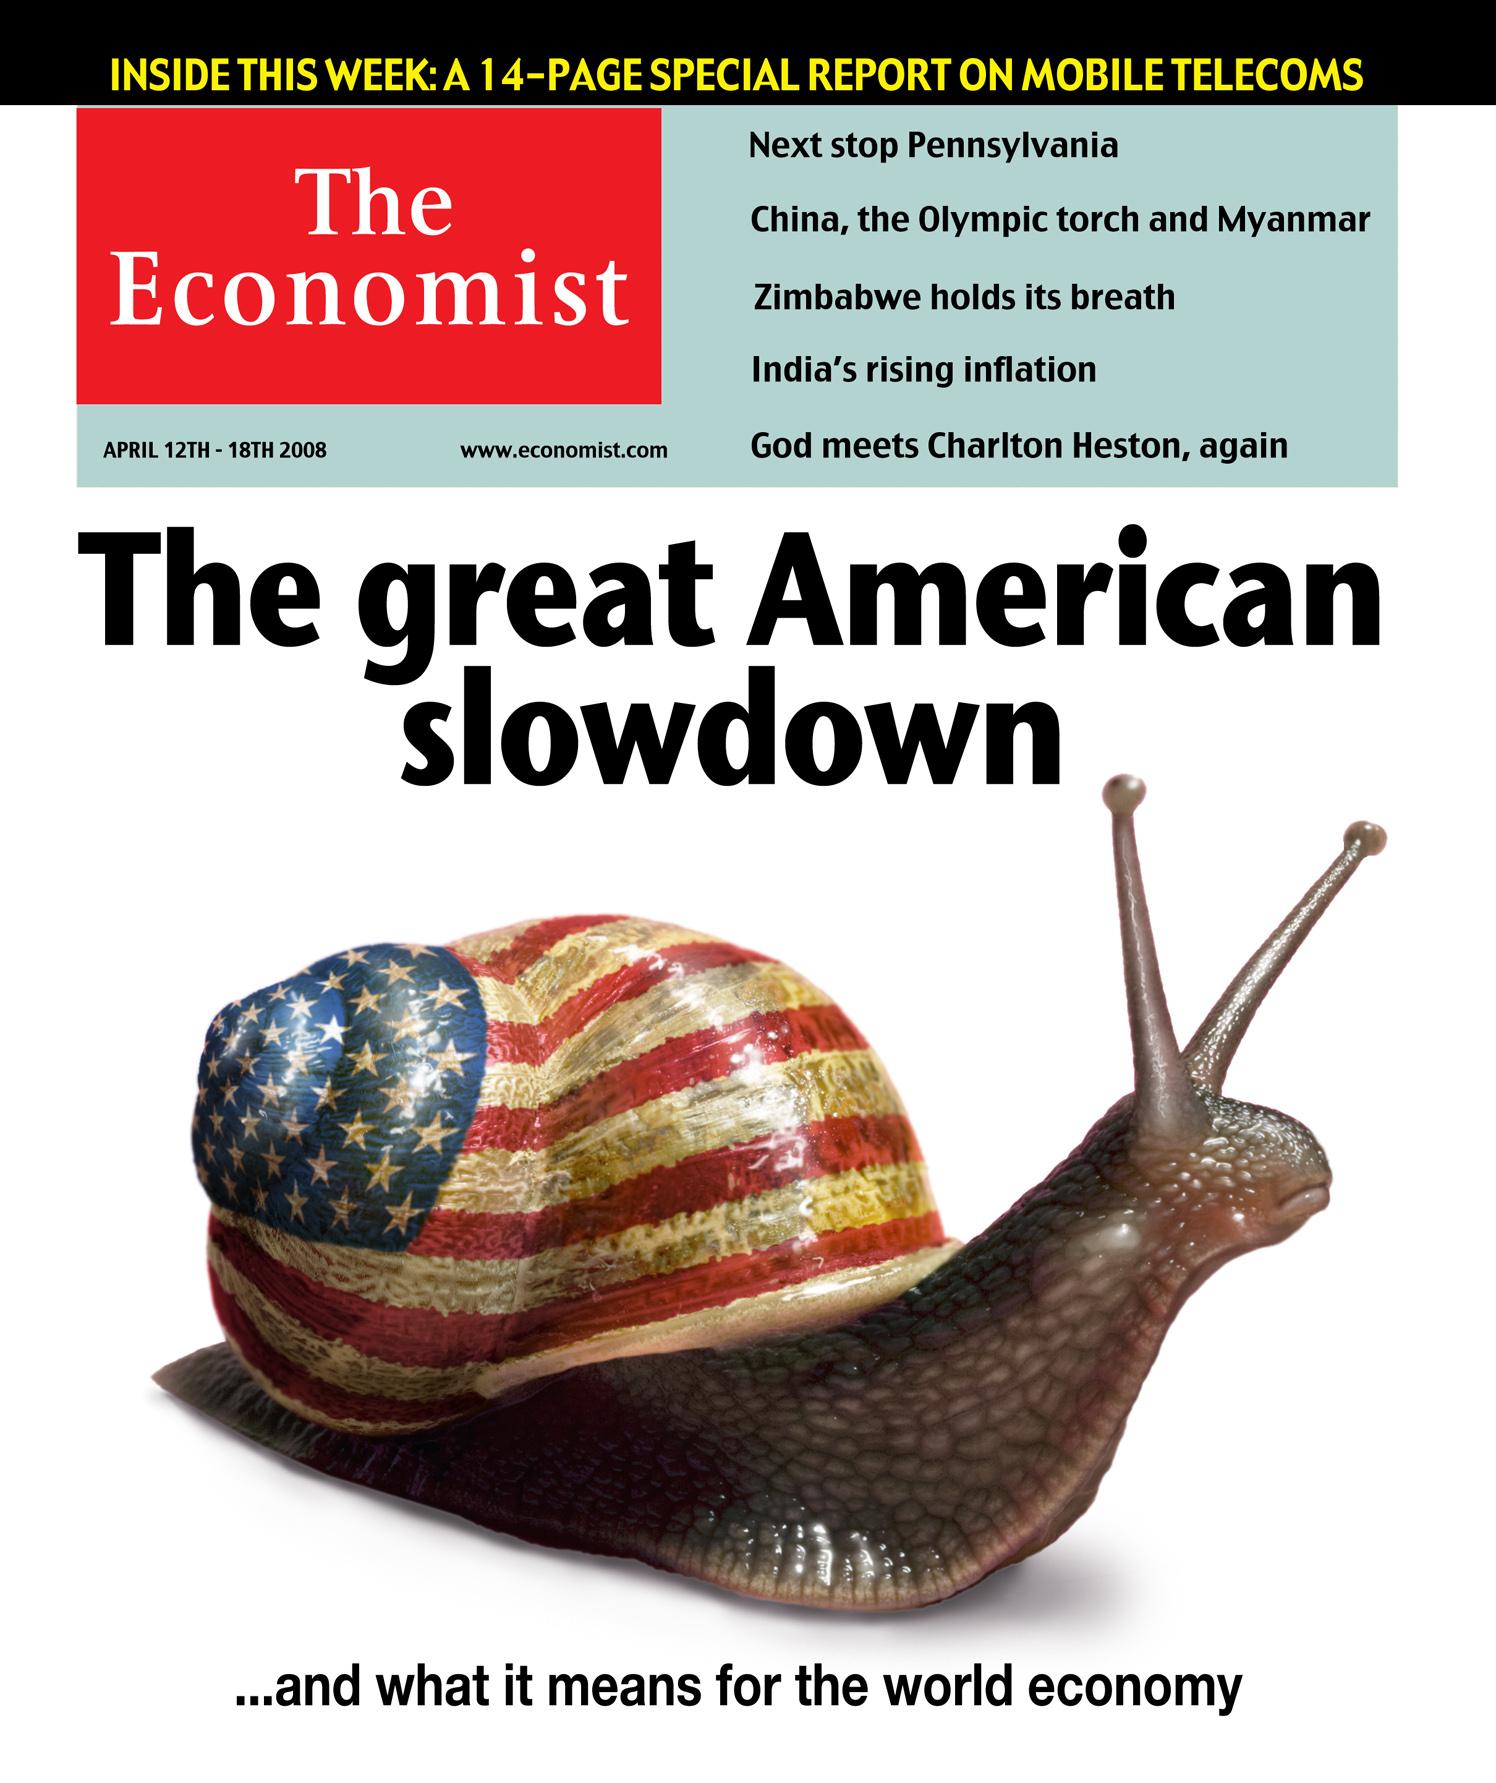 The Great American Slowdown / The Economist